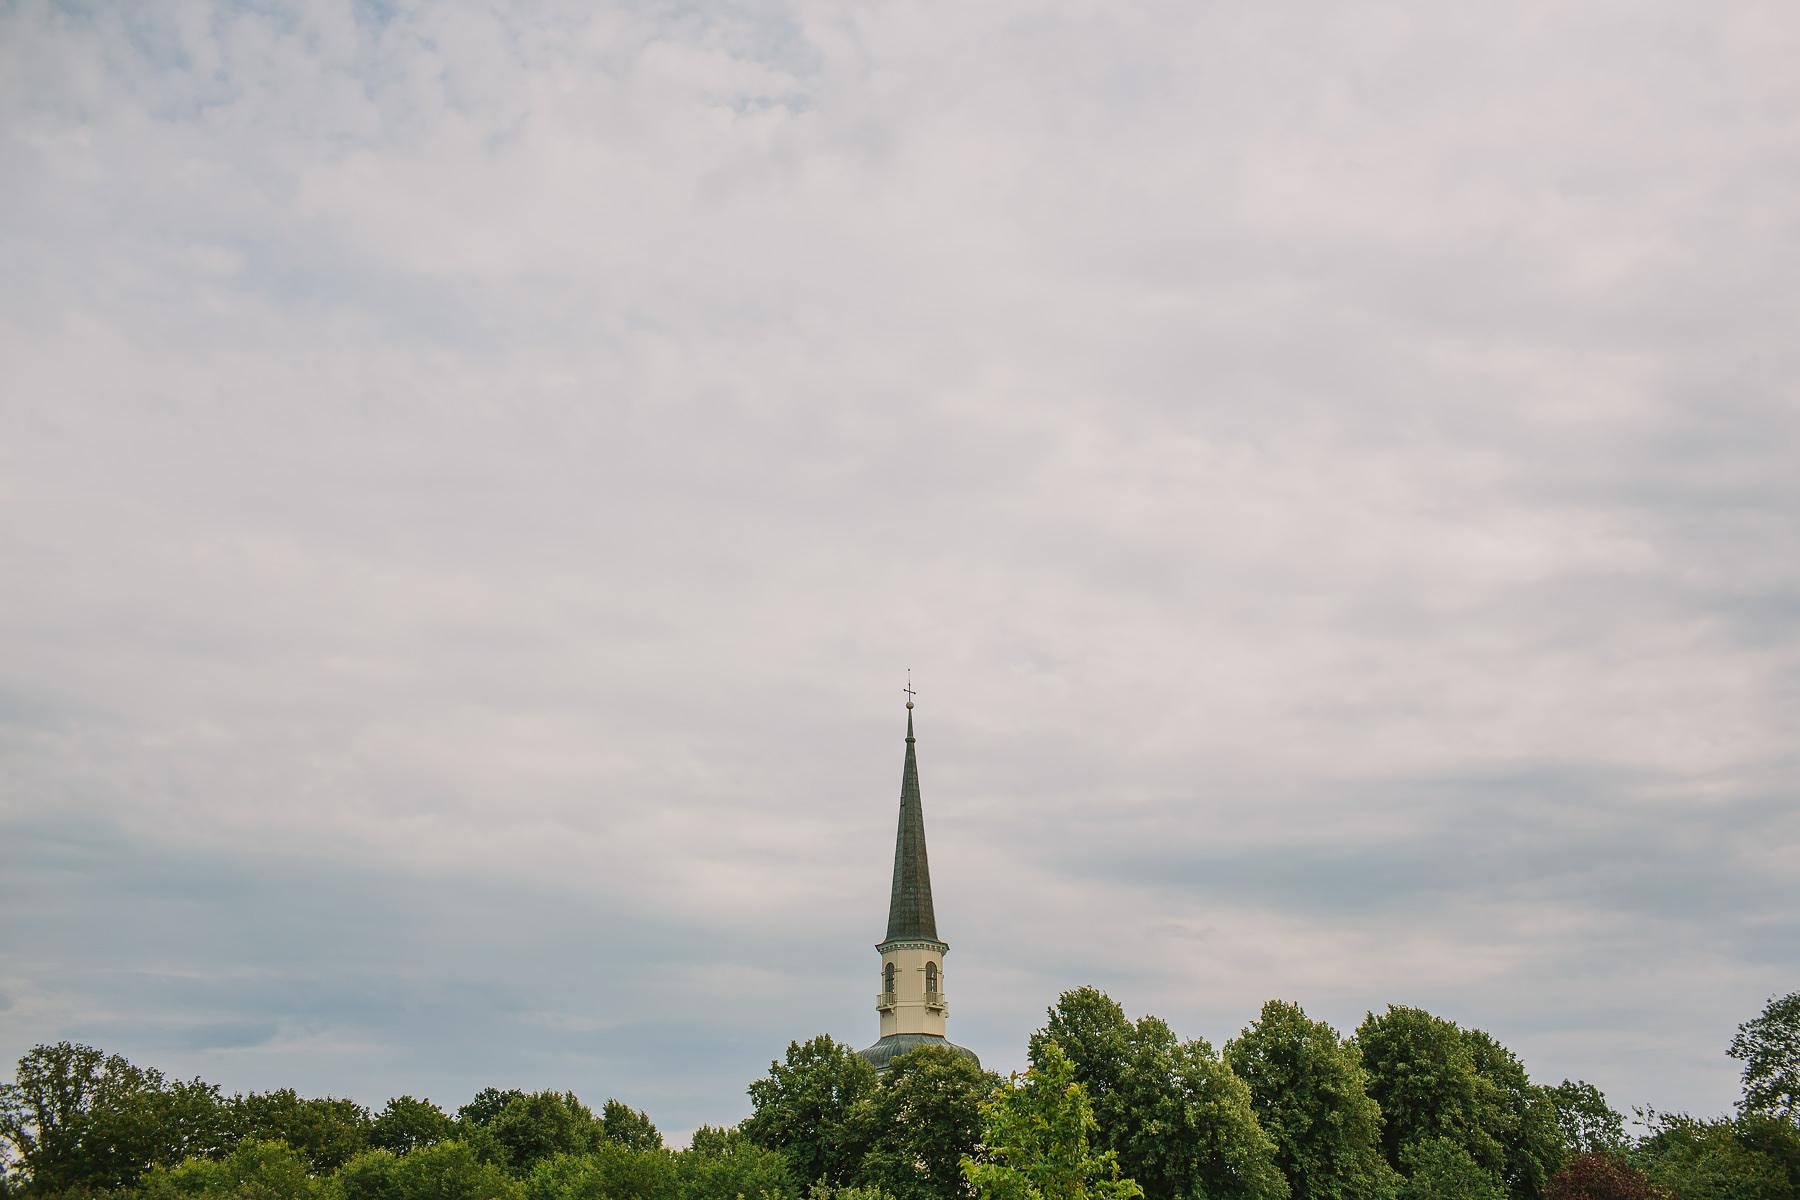 Tornet på ekerö kyrka